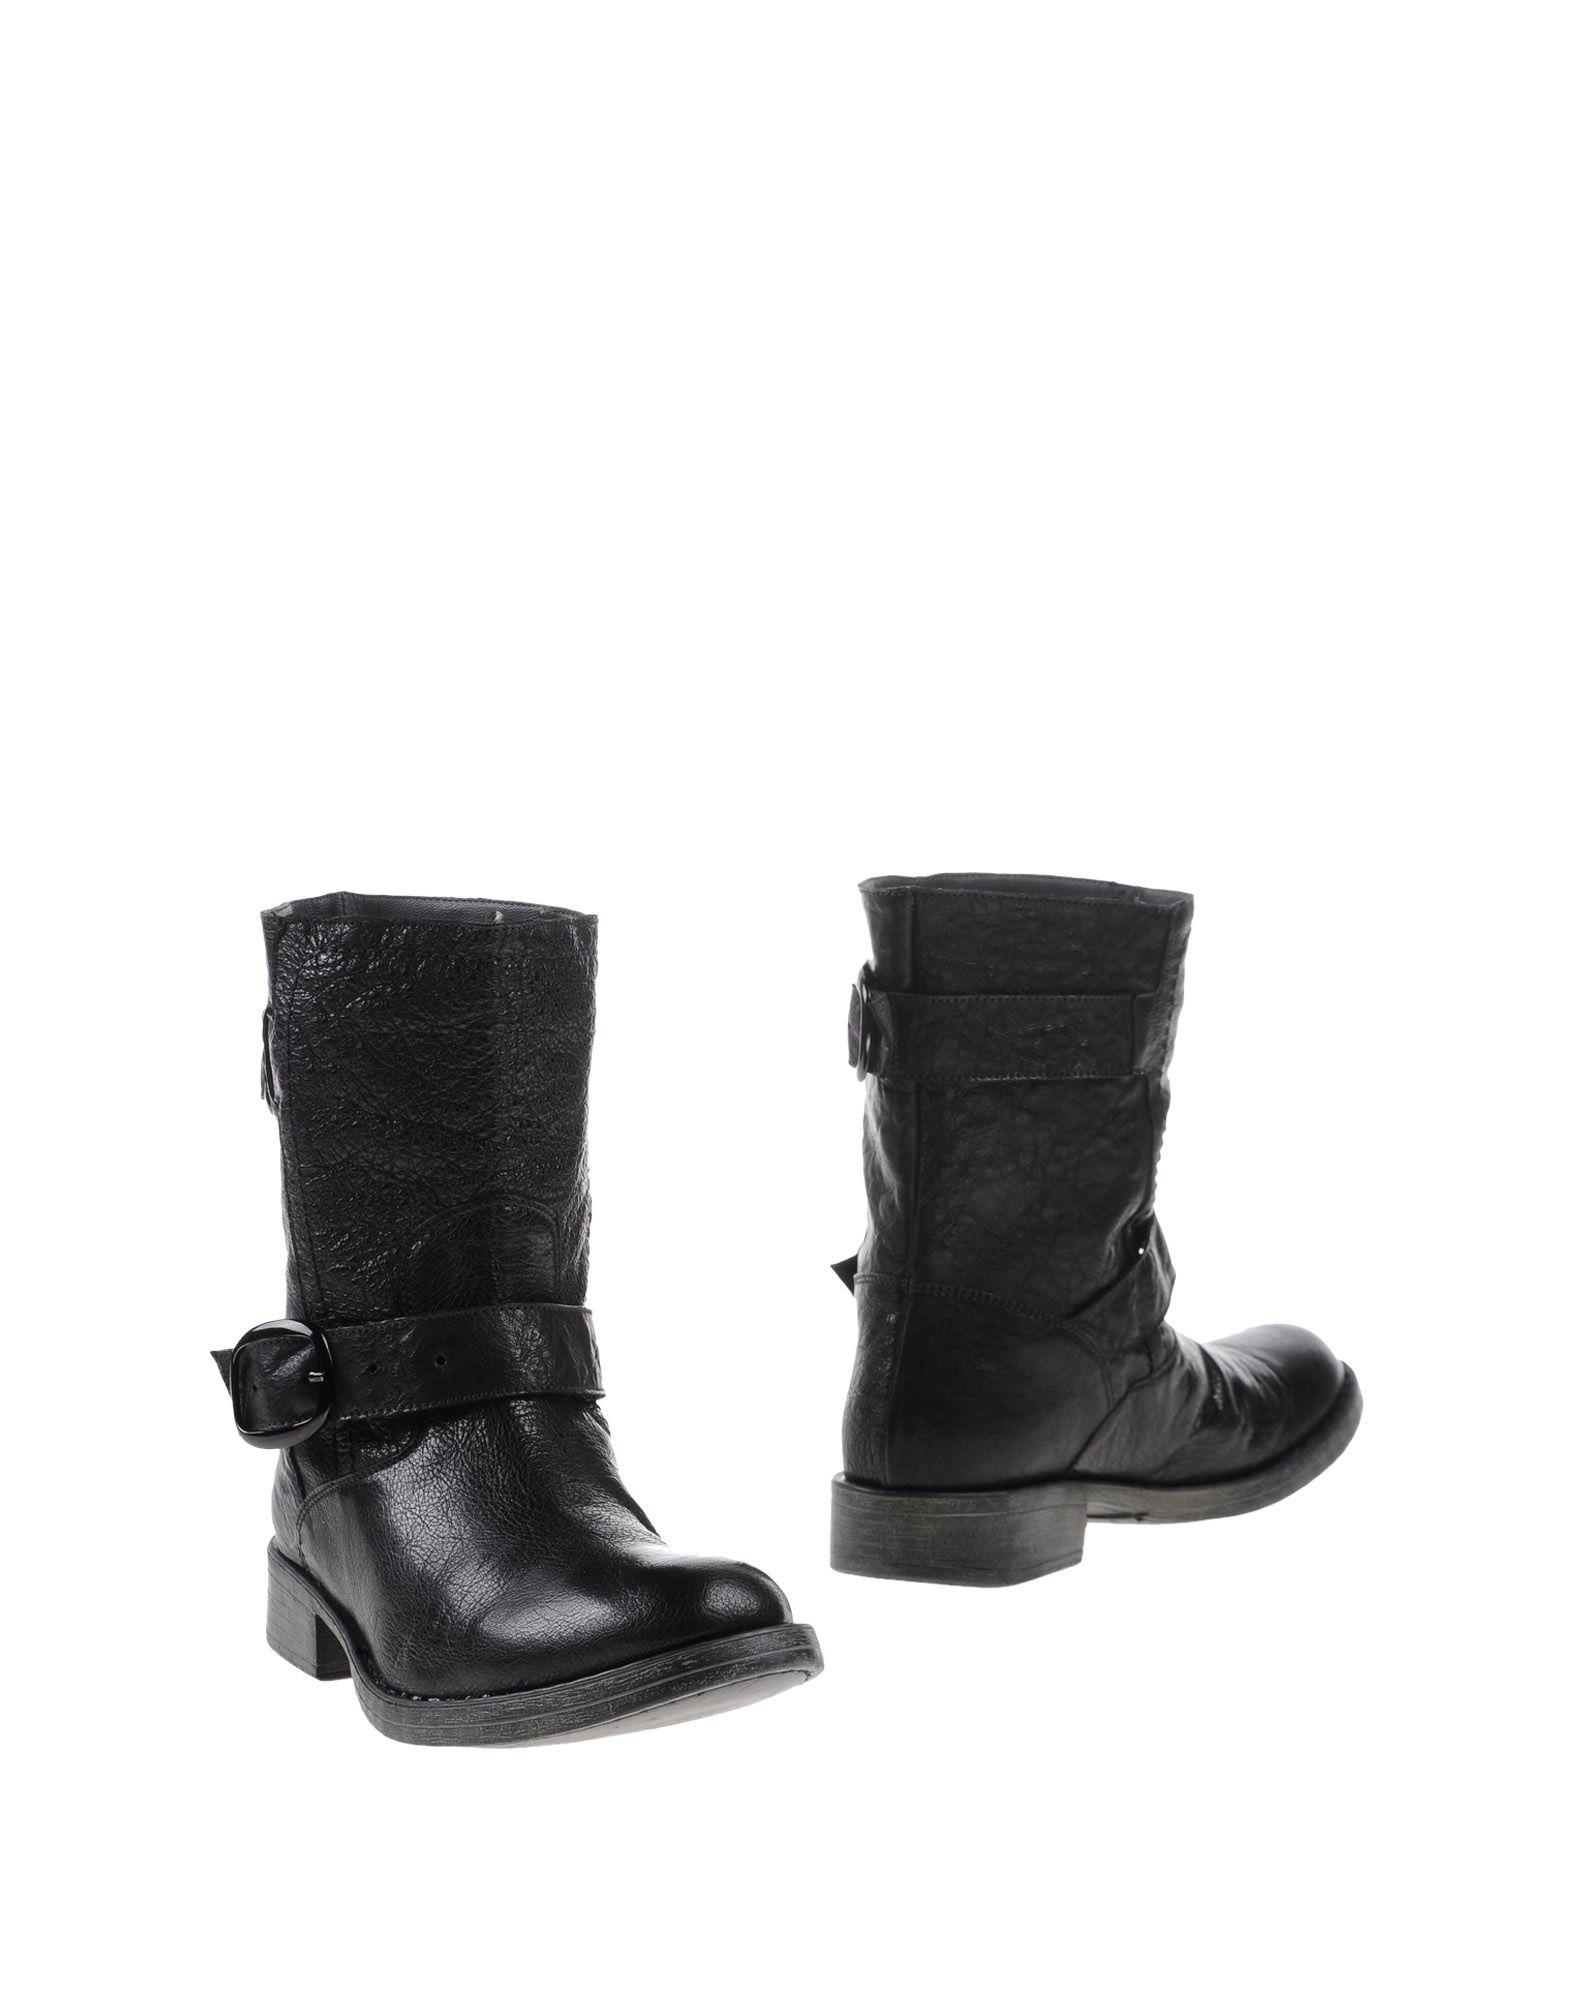 Stilvolle Malìparmi billige Schuhe Malìparmi Stilvolle Stiefelette Damen  11001164QO 974452